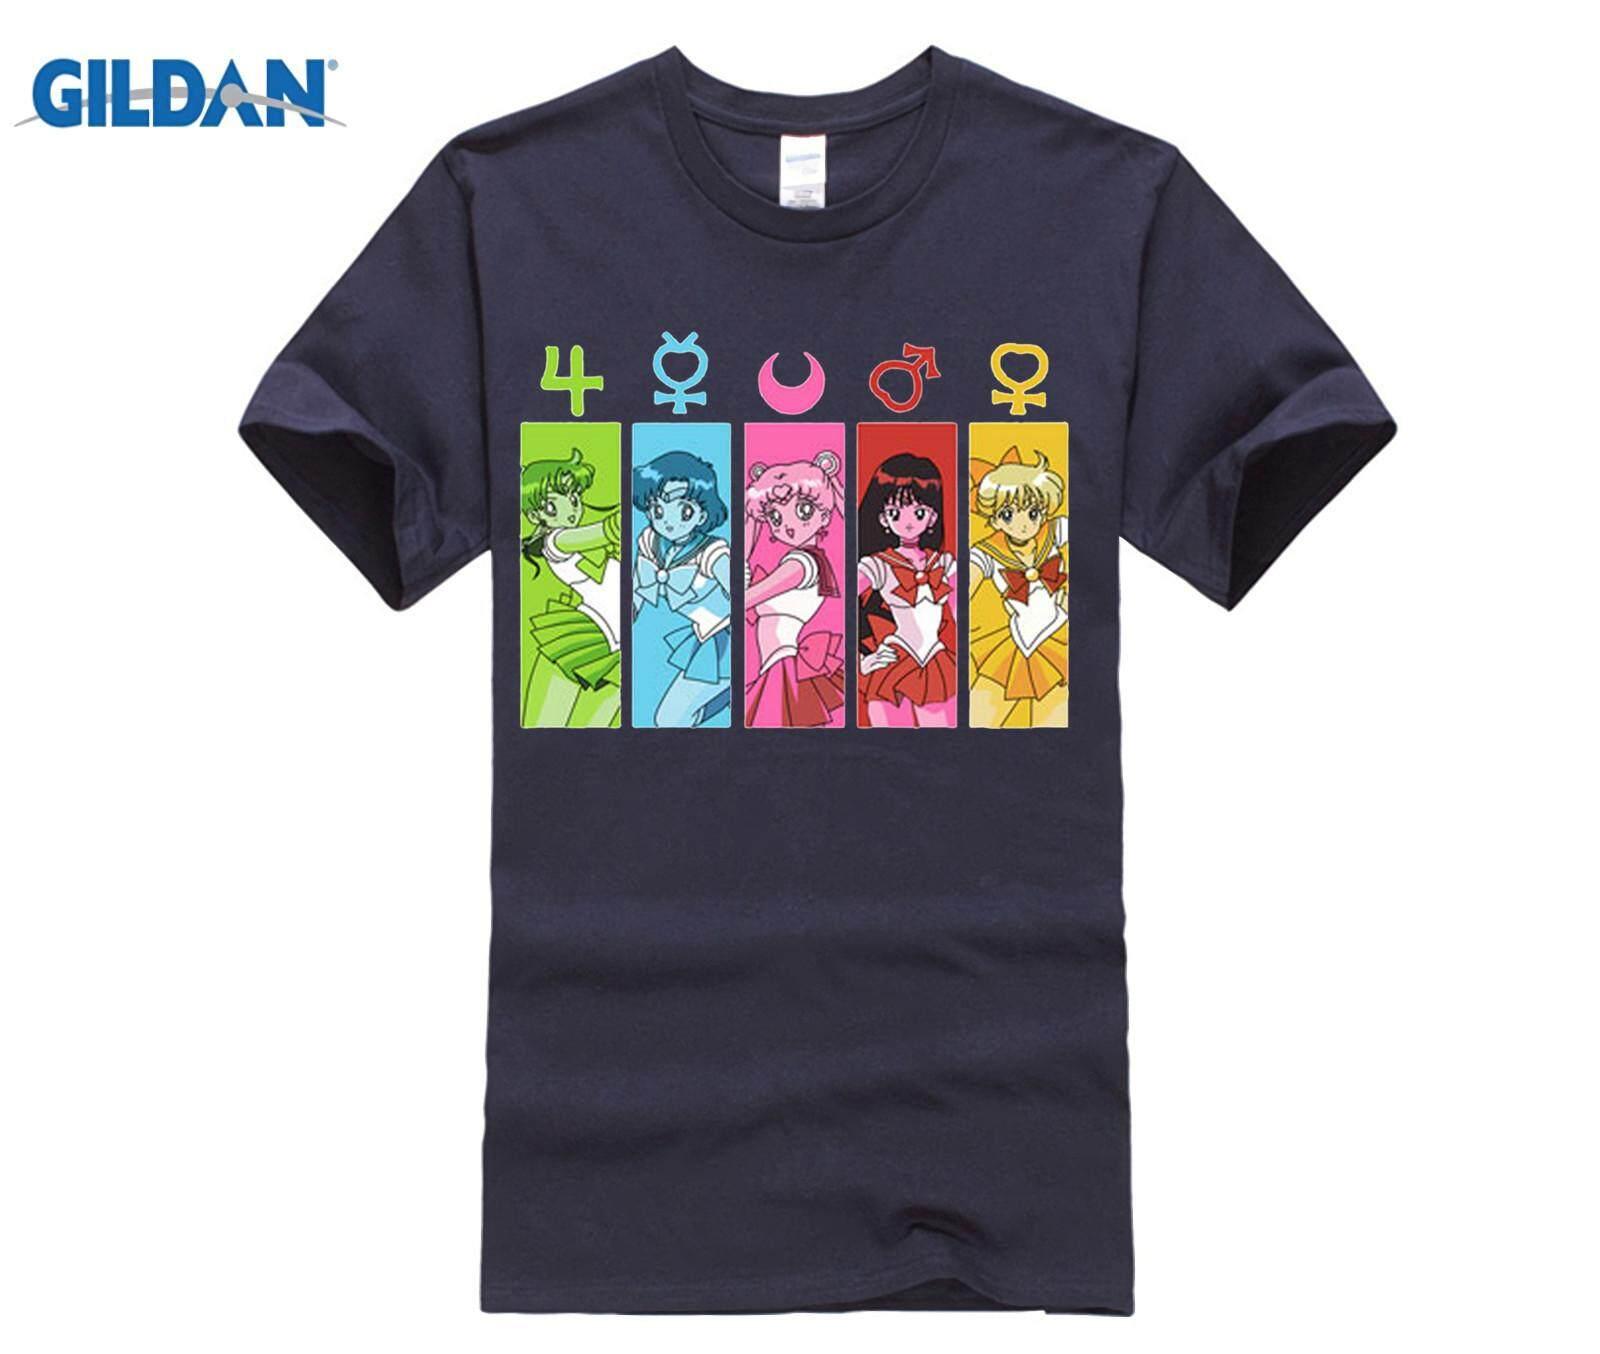 d8f1e9cad2 XS Anime Sailor Moon Adult T shirt cotton o-neck Summer t-shirt Men